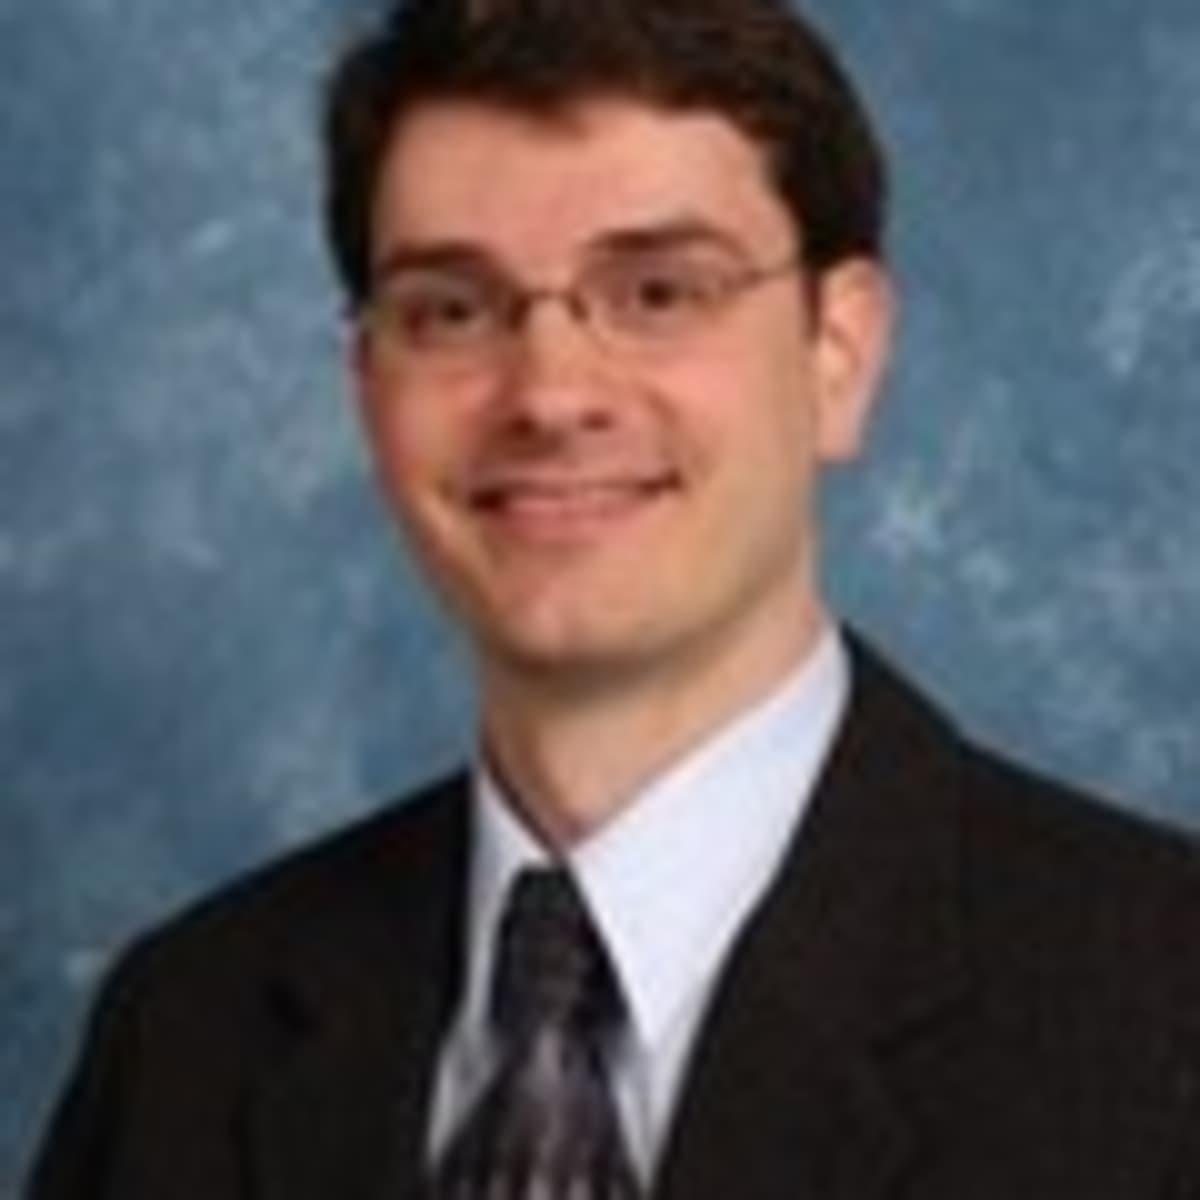 Credentials Dr Thomas Staley Md Davenport Ia